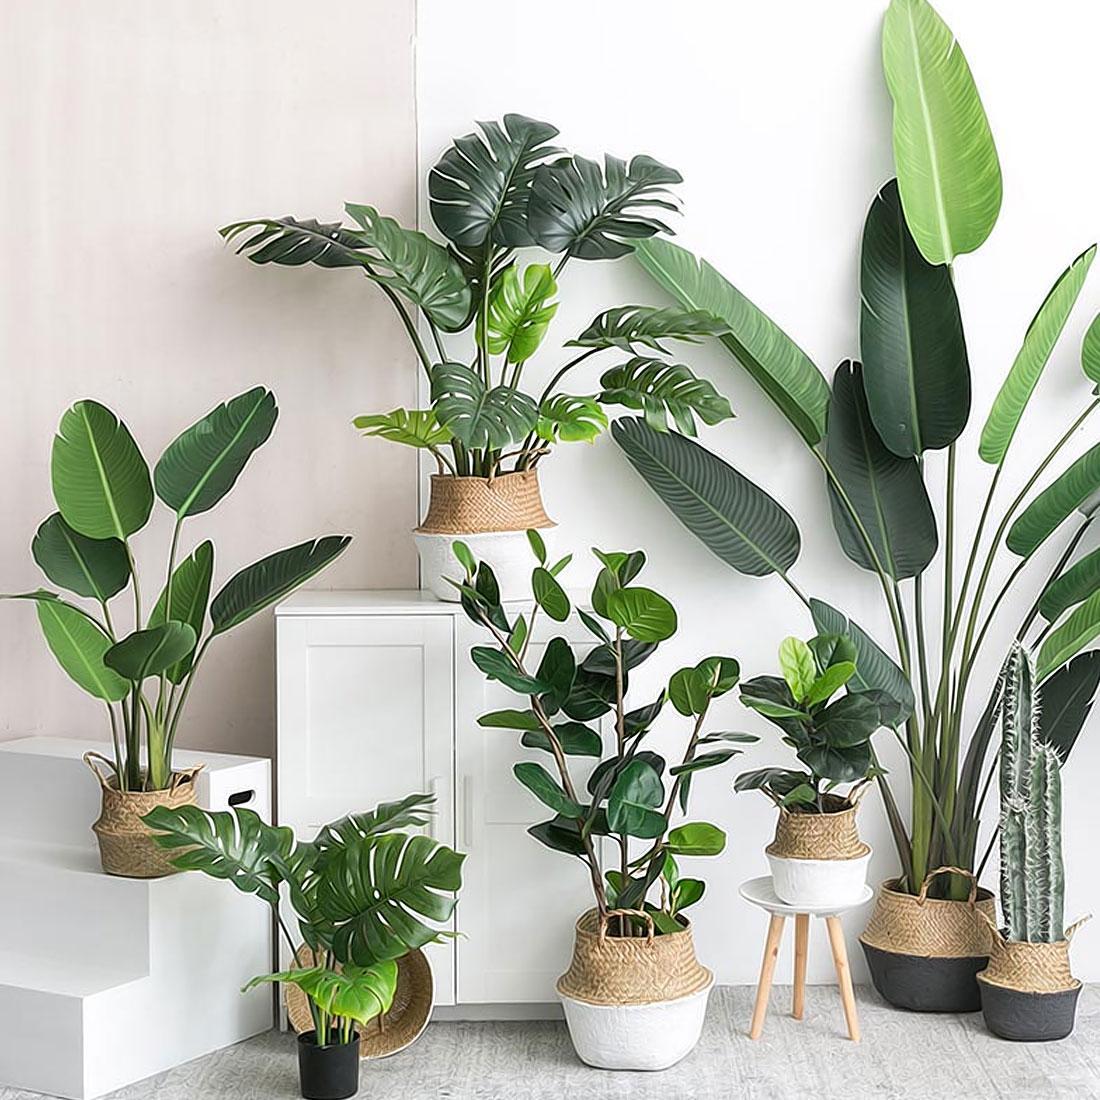 2019 Artificial Plants Green Turtle Leaves Garden Home decor 1 Bouquet Mexican Autumn Decoration artificial grass plant